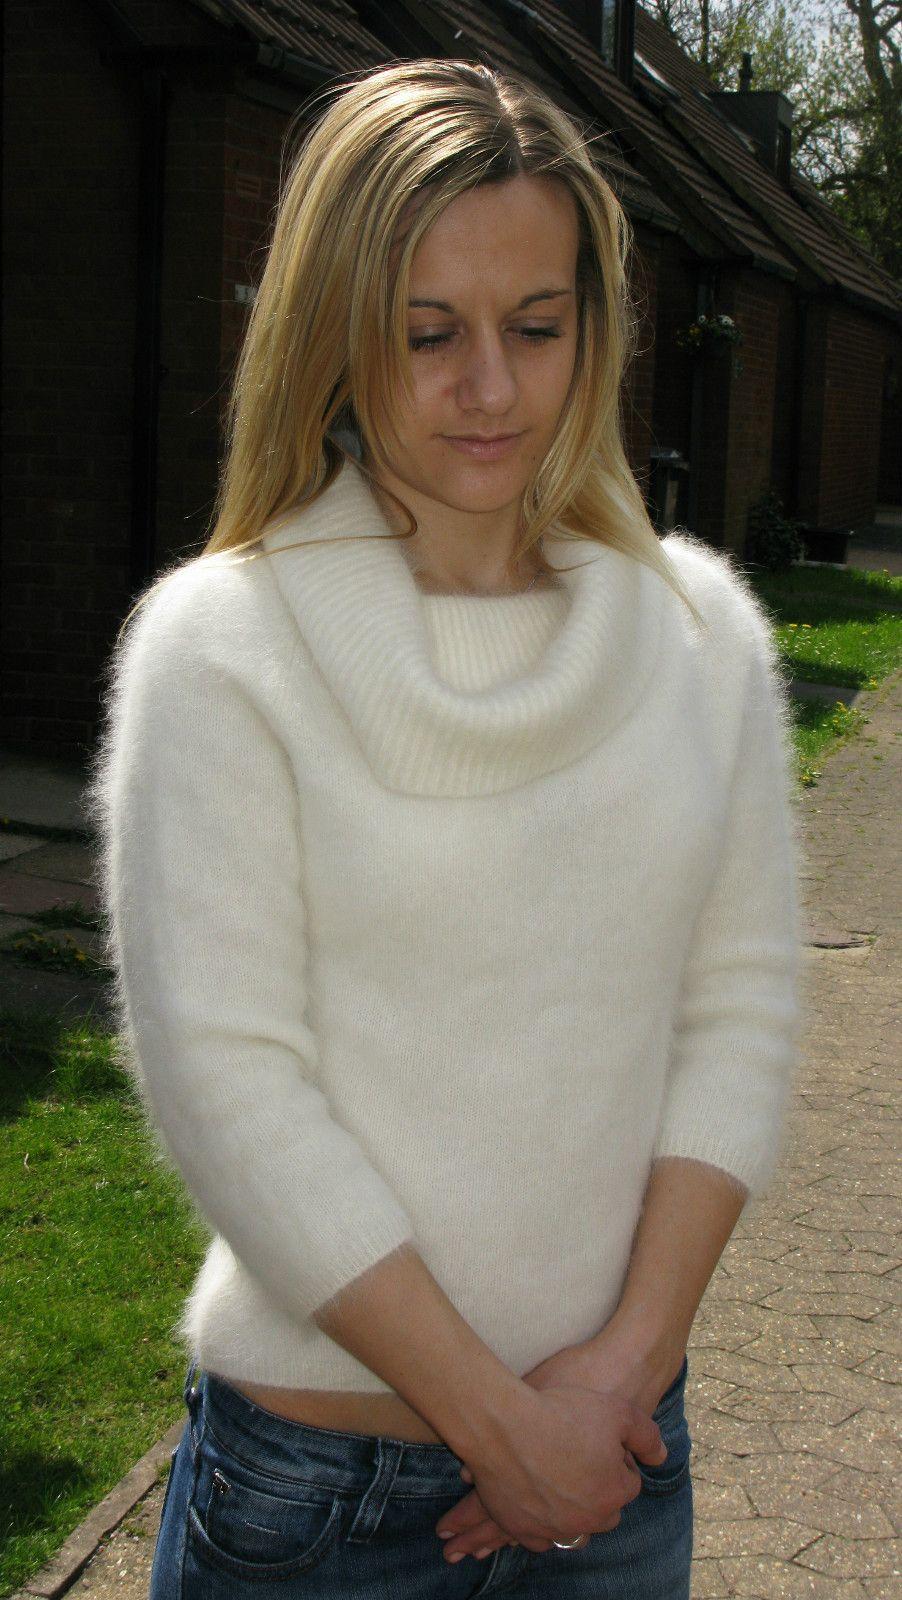 White Cowl Neck Angora Sweater In 2019 Angora Sweater